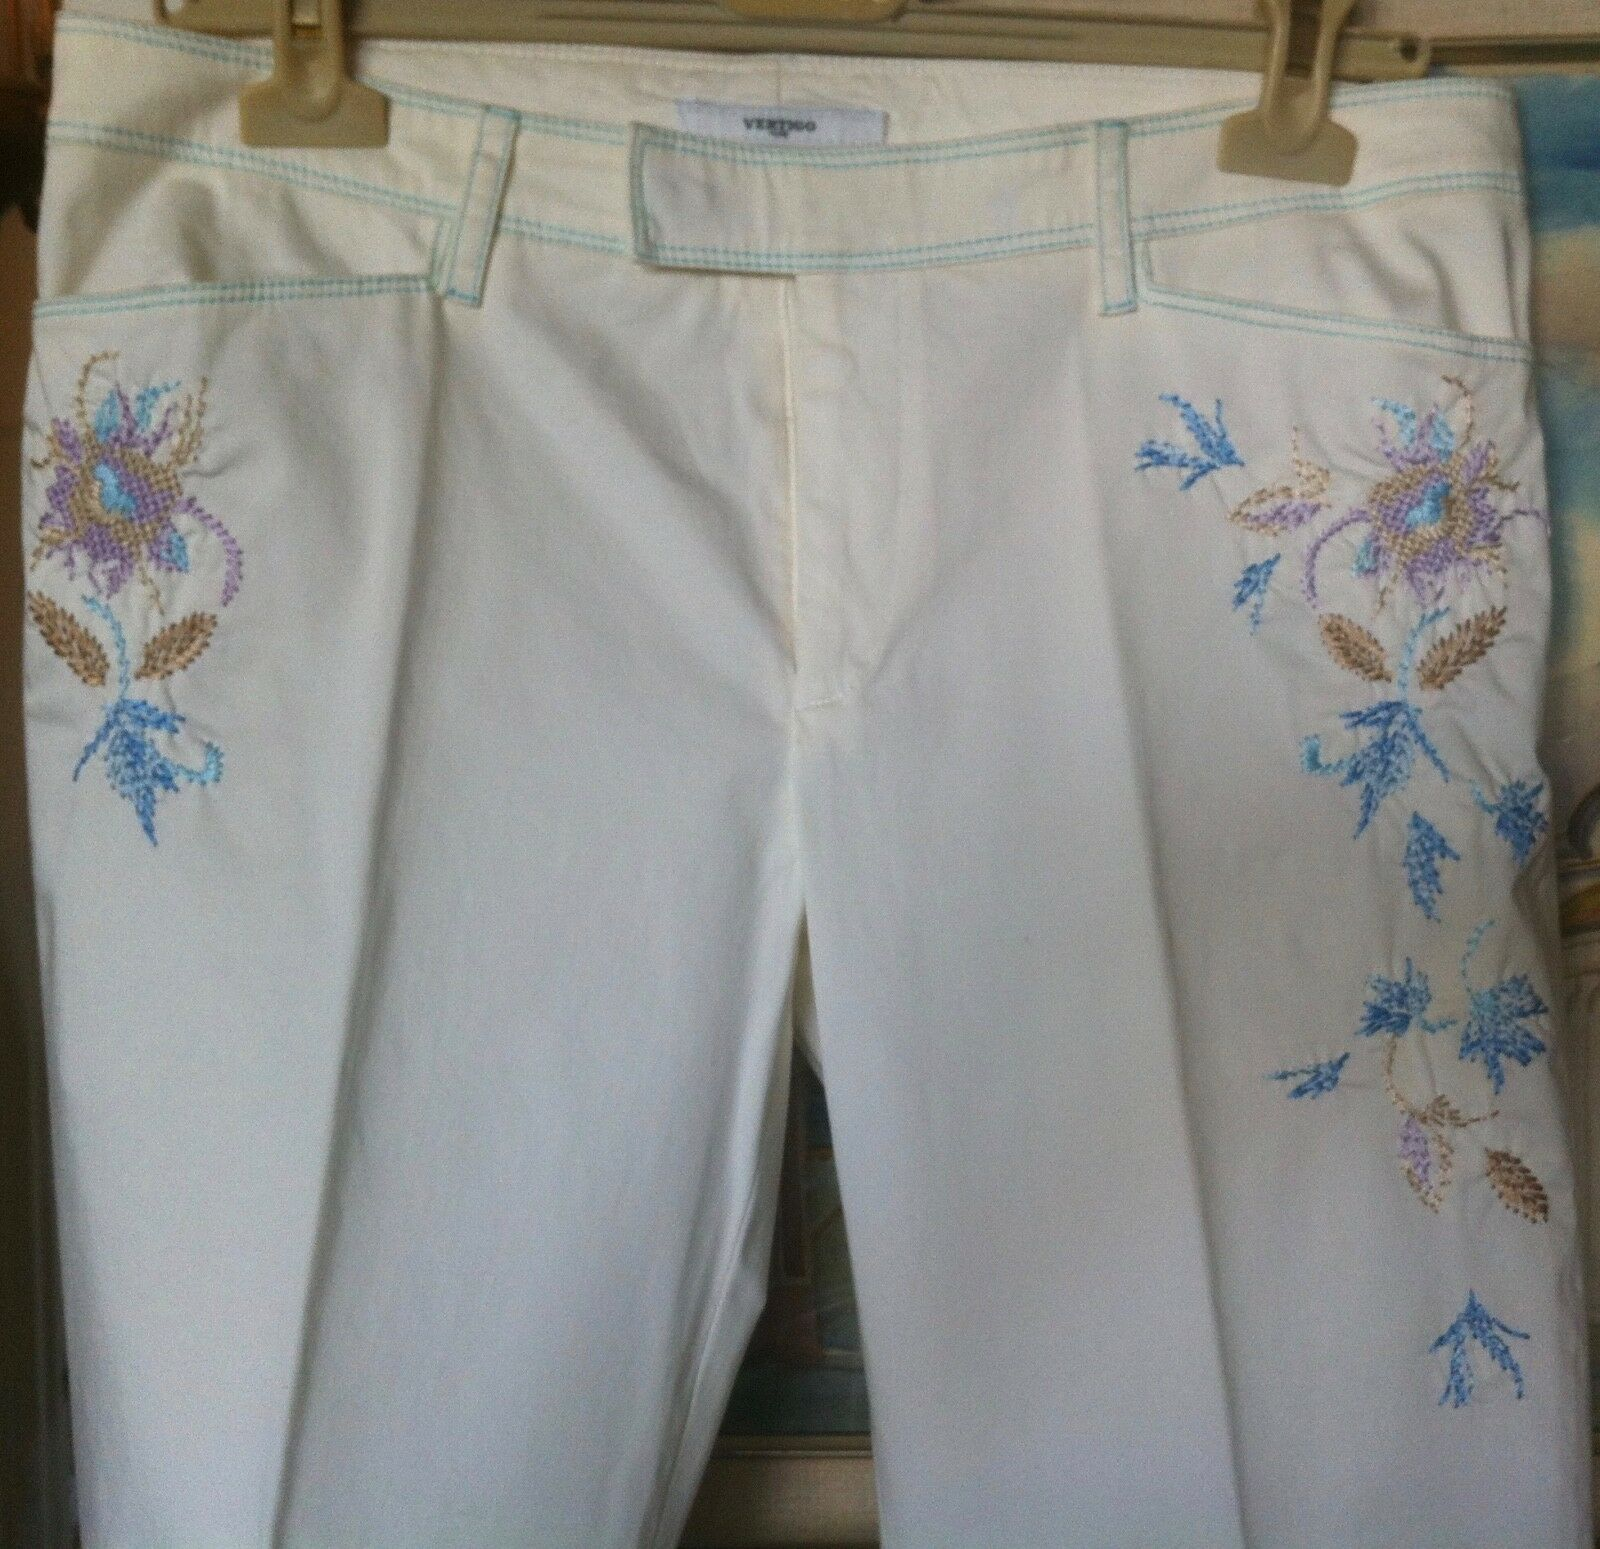 verdeIGO blancoo Algodón  Pantalones Sueltos Pantalones para Bordado Jeans Nuevo FR 42 US 10  elige tu favorito